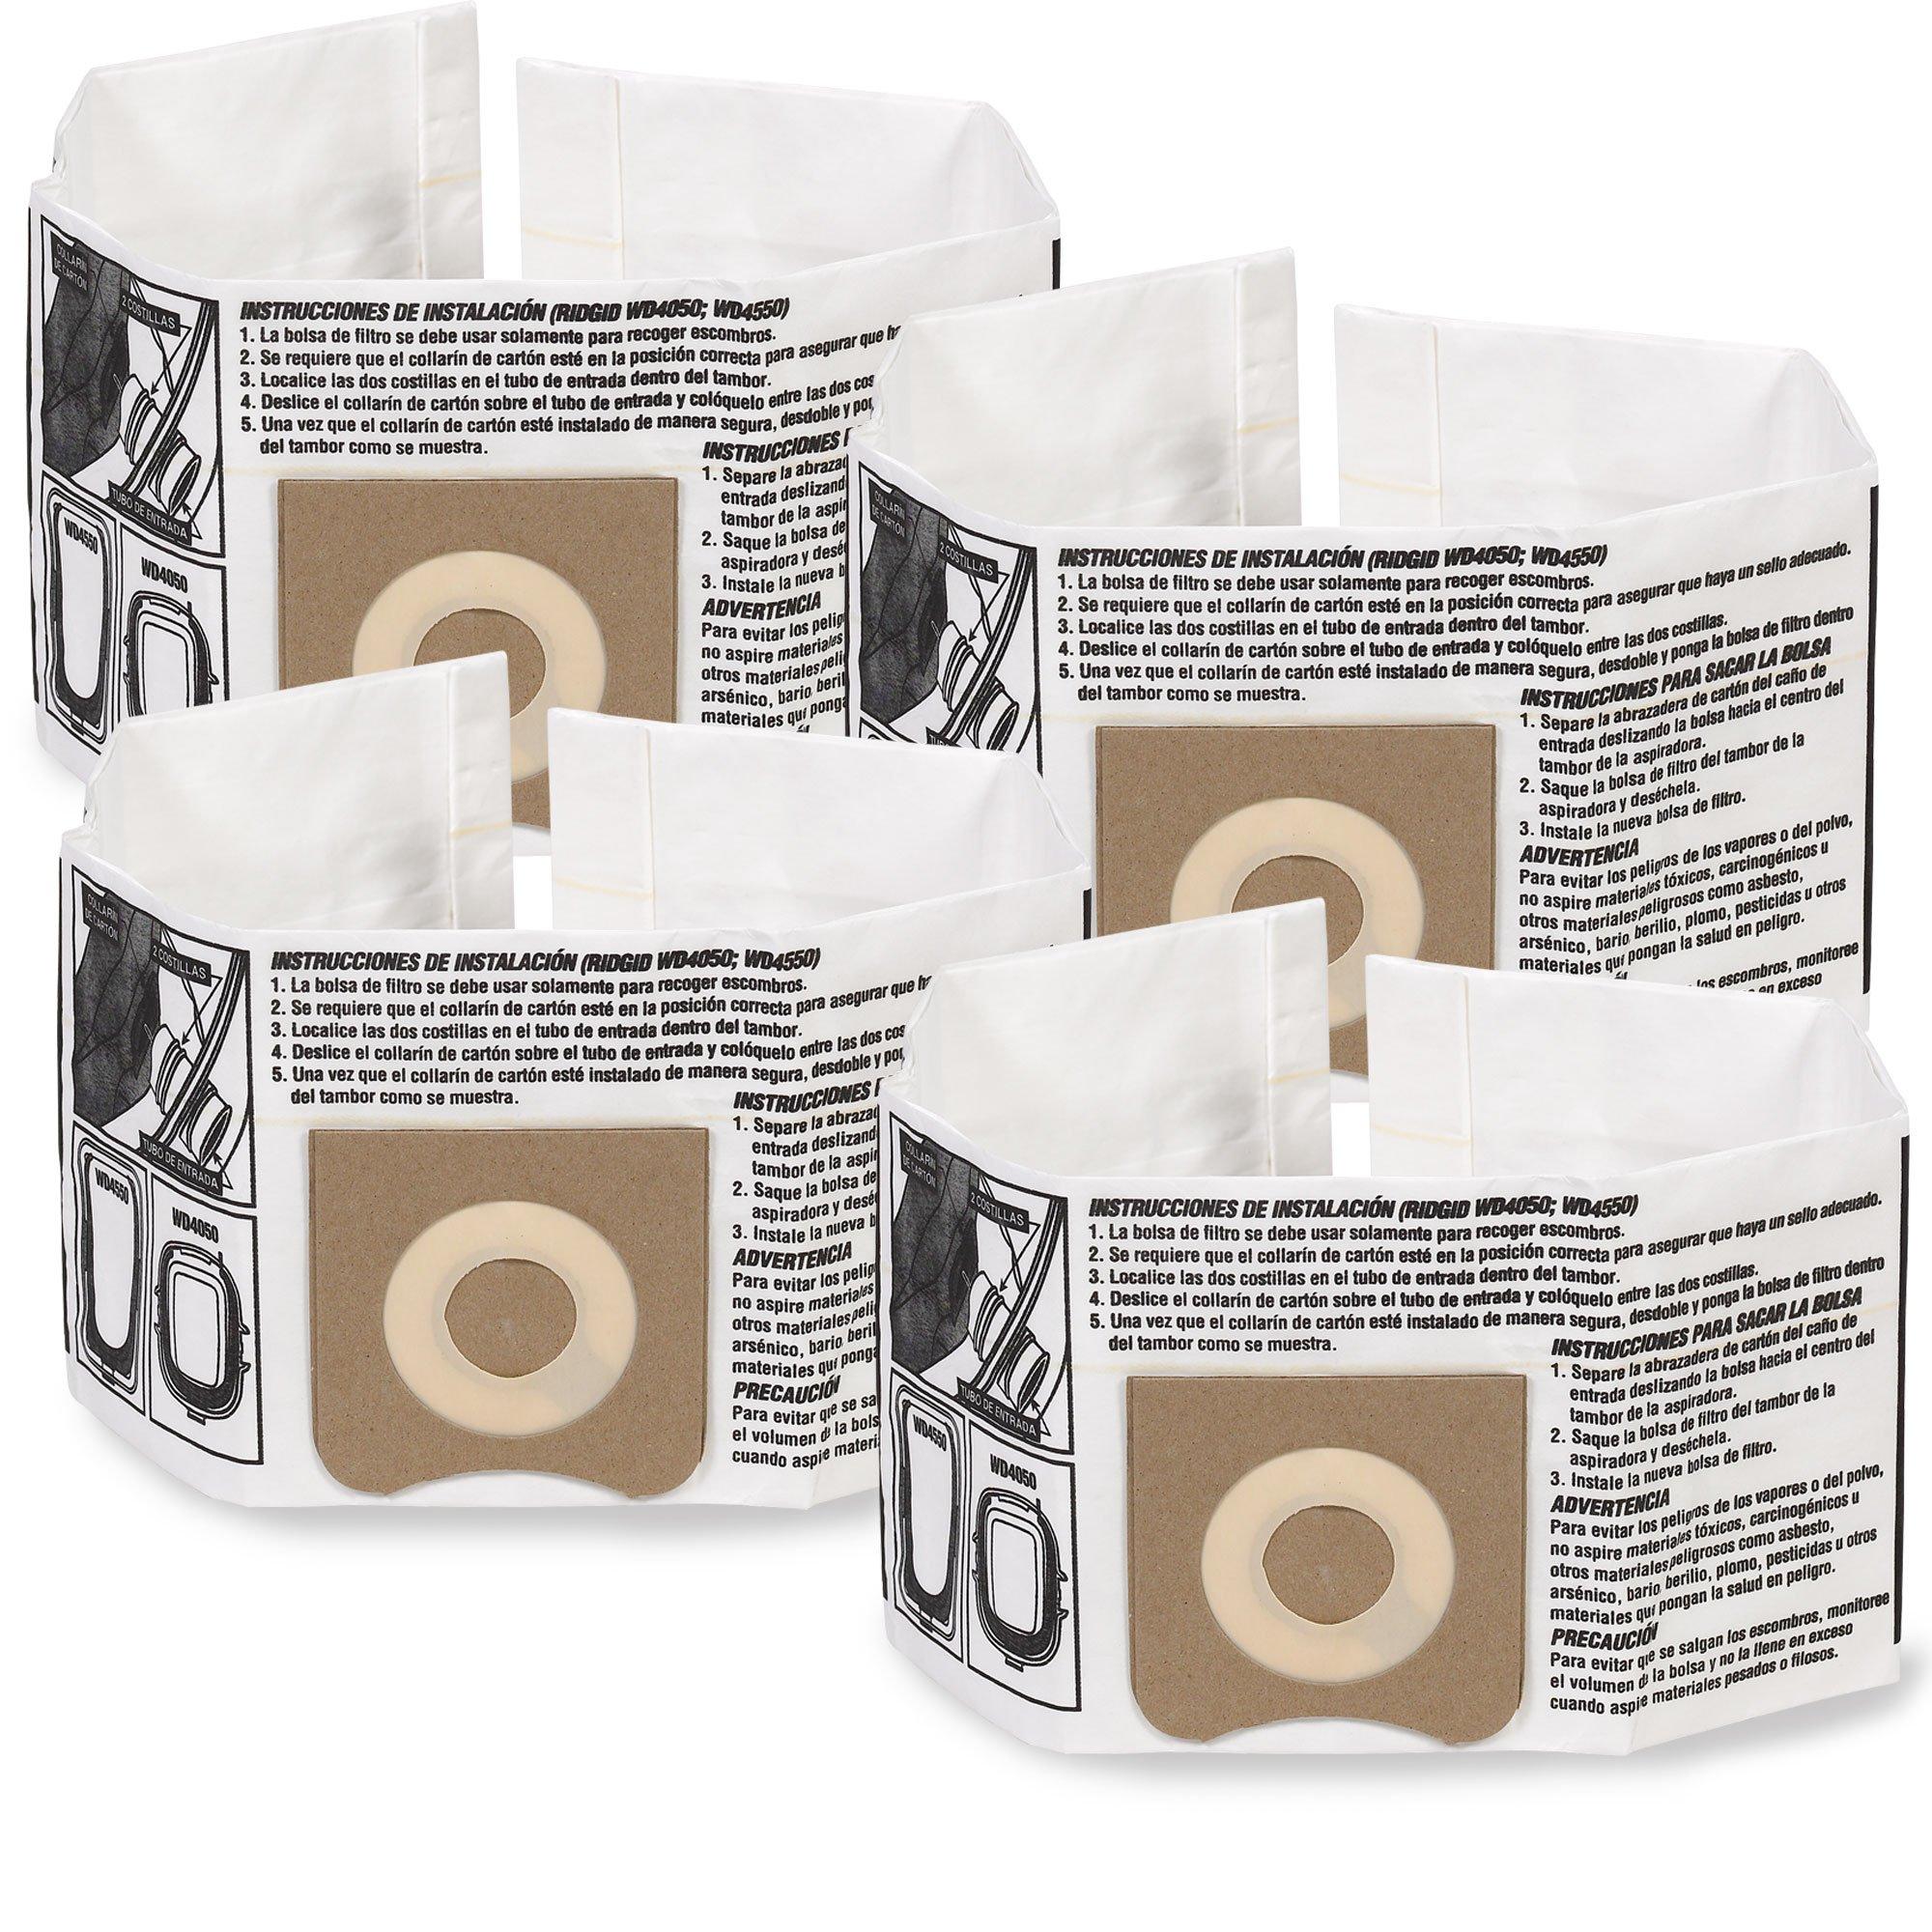 WORKSHOP Wet Dry Vacuum Bags WS32045F2 Fine Dust Collection Shop Vacuum Bags (2-Pack / 4 Shop Vacuum Bags), Bag Filter For WORKSHOP 3-Gallon To 4- 1/2 Gallon Shop Vacuum Cleaners by WORKSHOP Wet/Dry Vacs (Image #1)